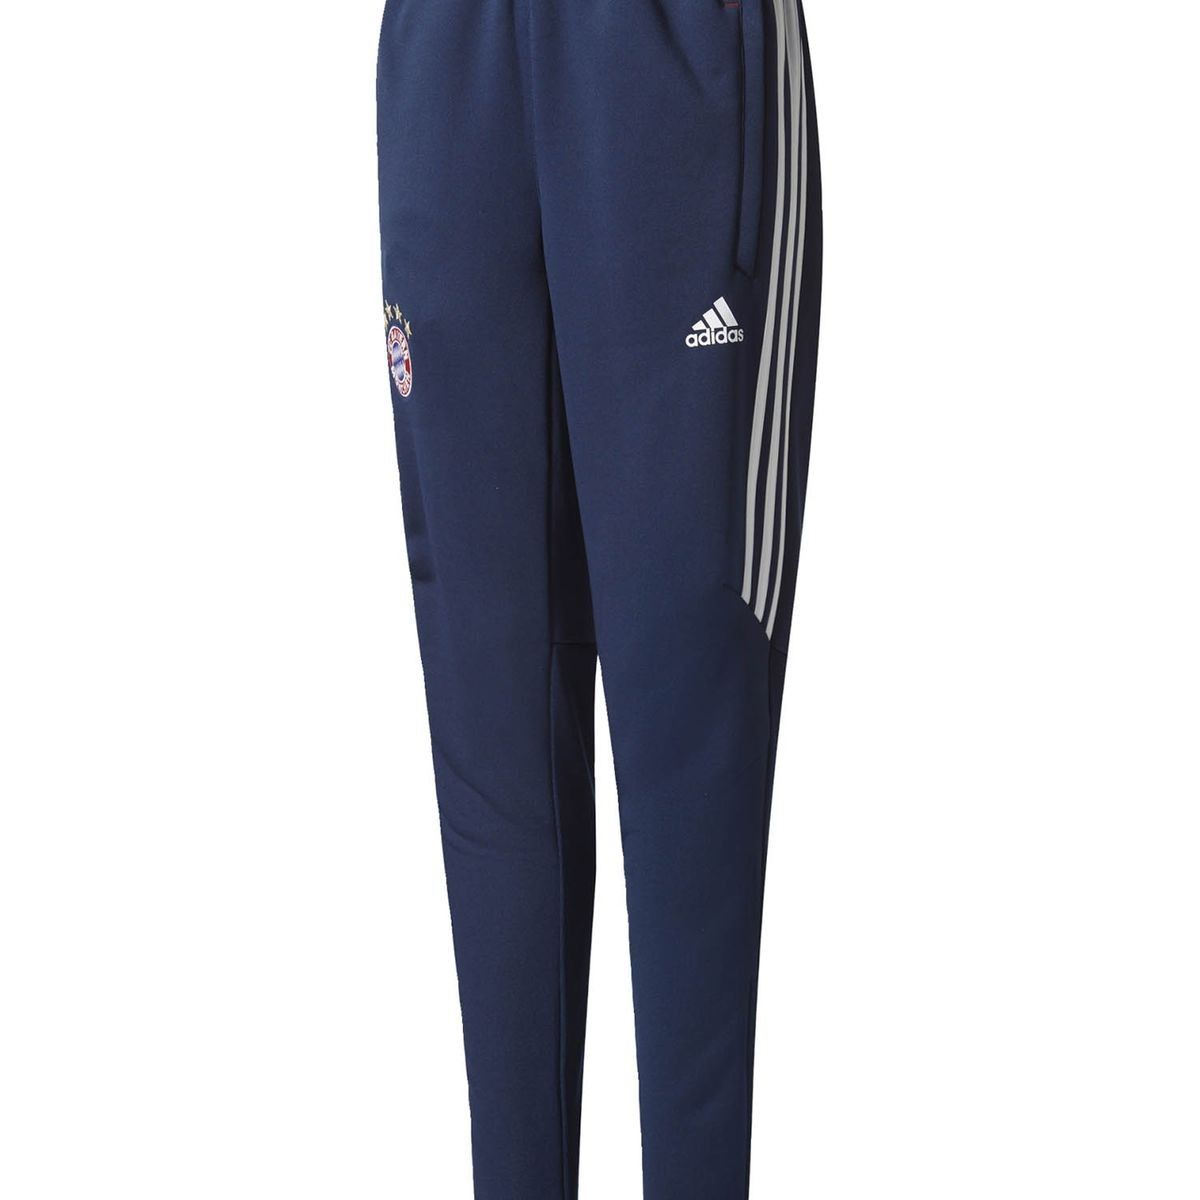 pantalon adidas femme foot